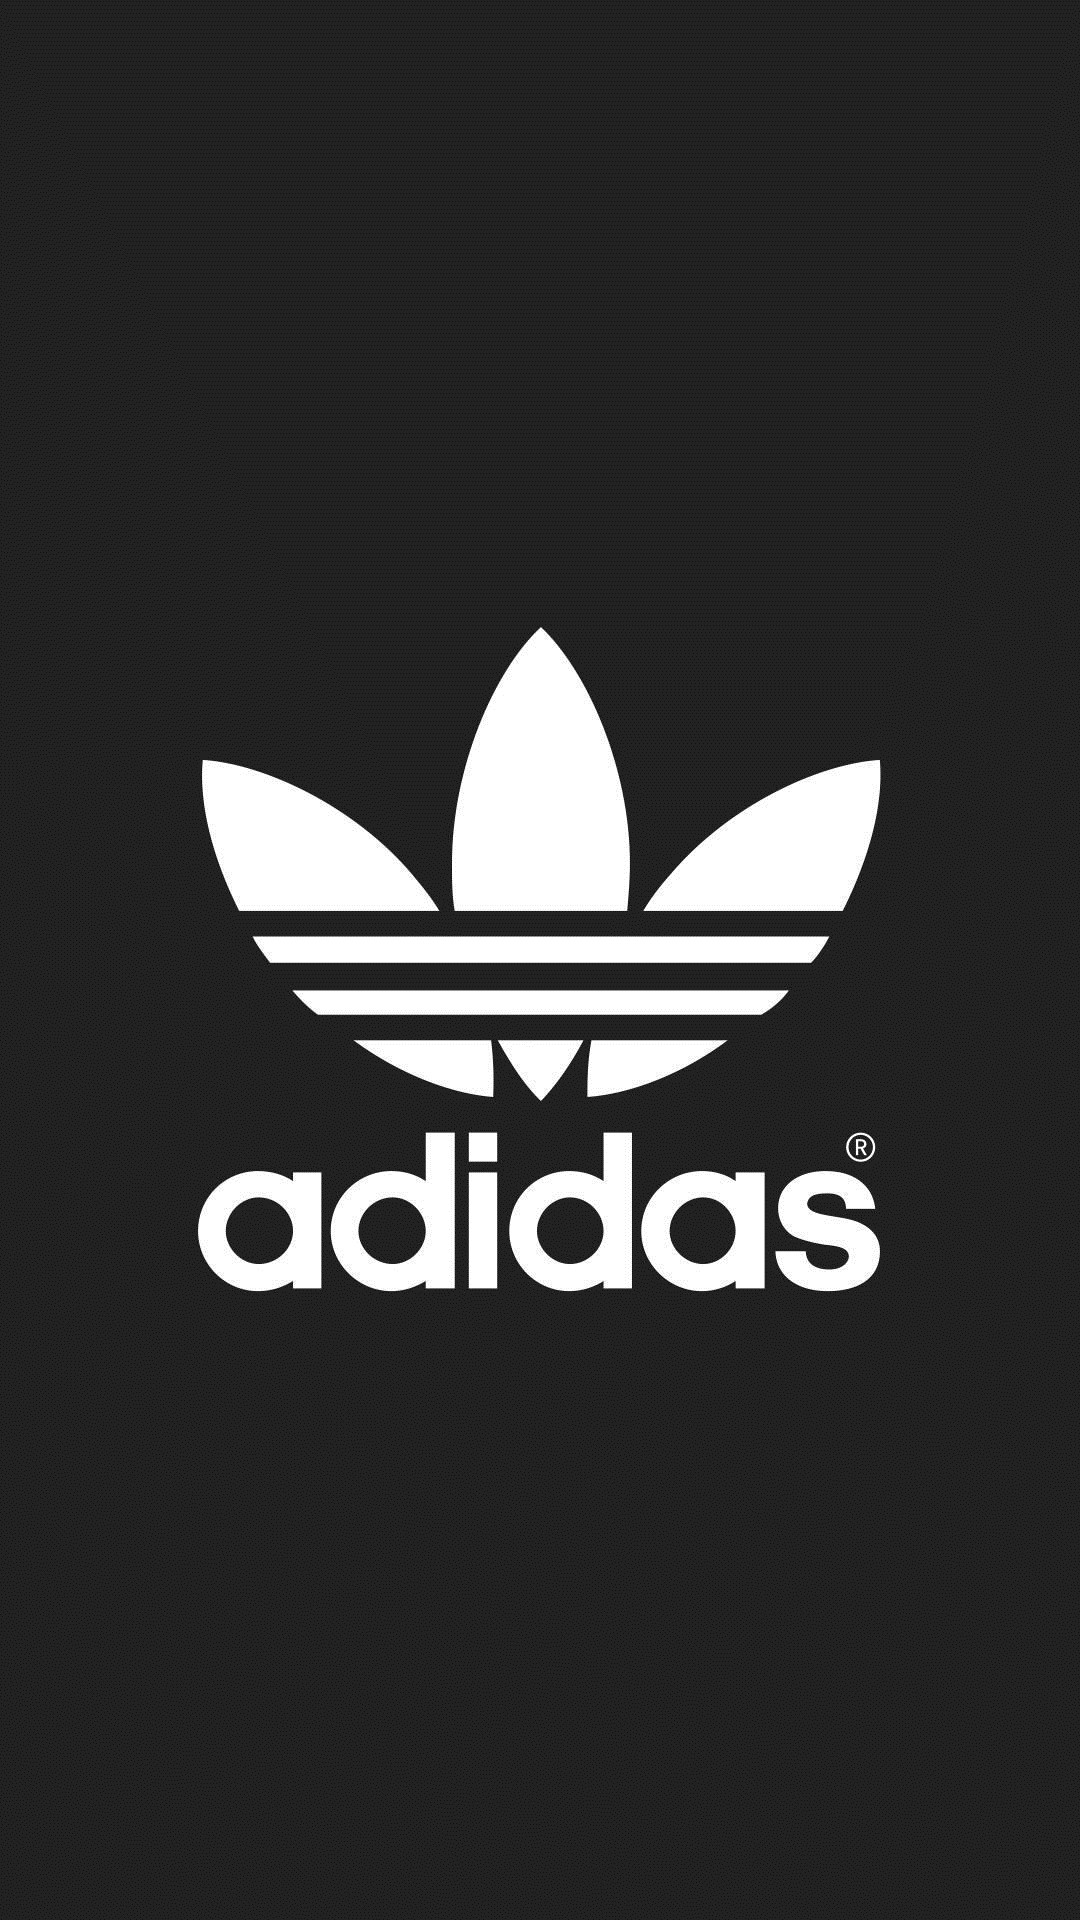 Black Adidas iPhone wallpaper